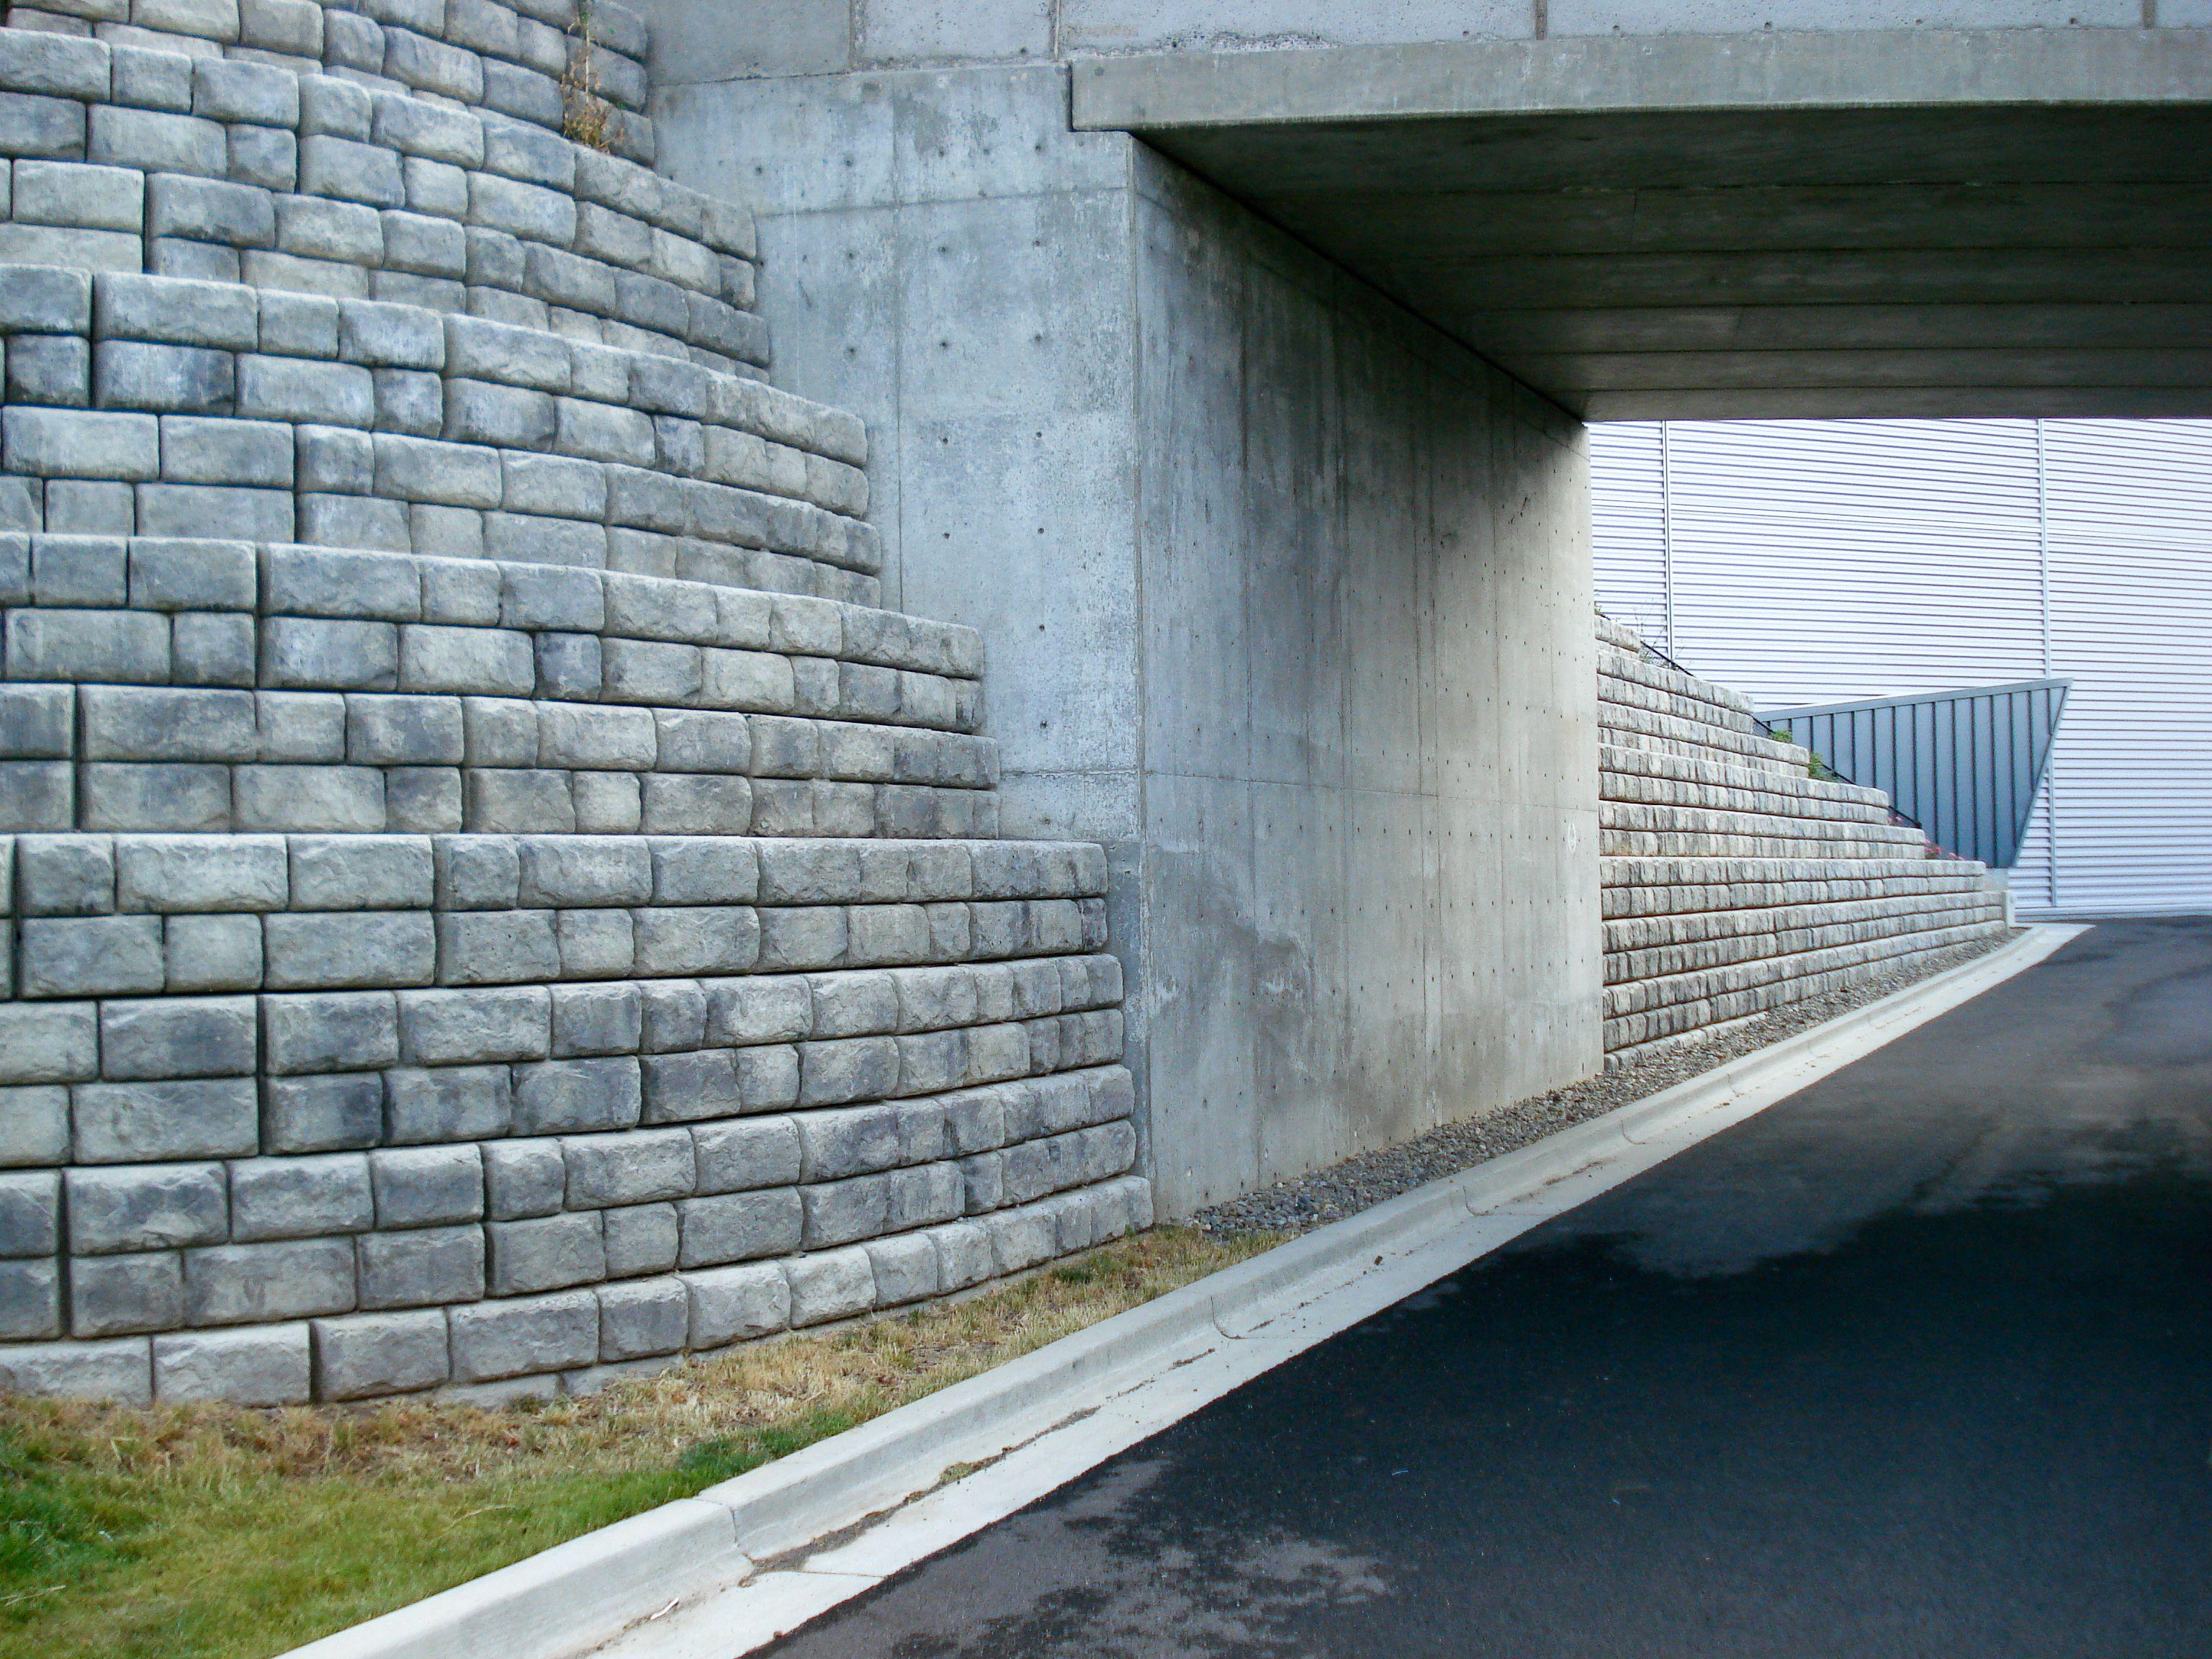 Tiered Cobblestone retaining wall with planter blocks